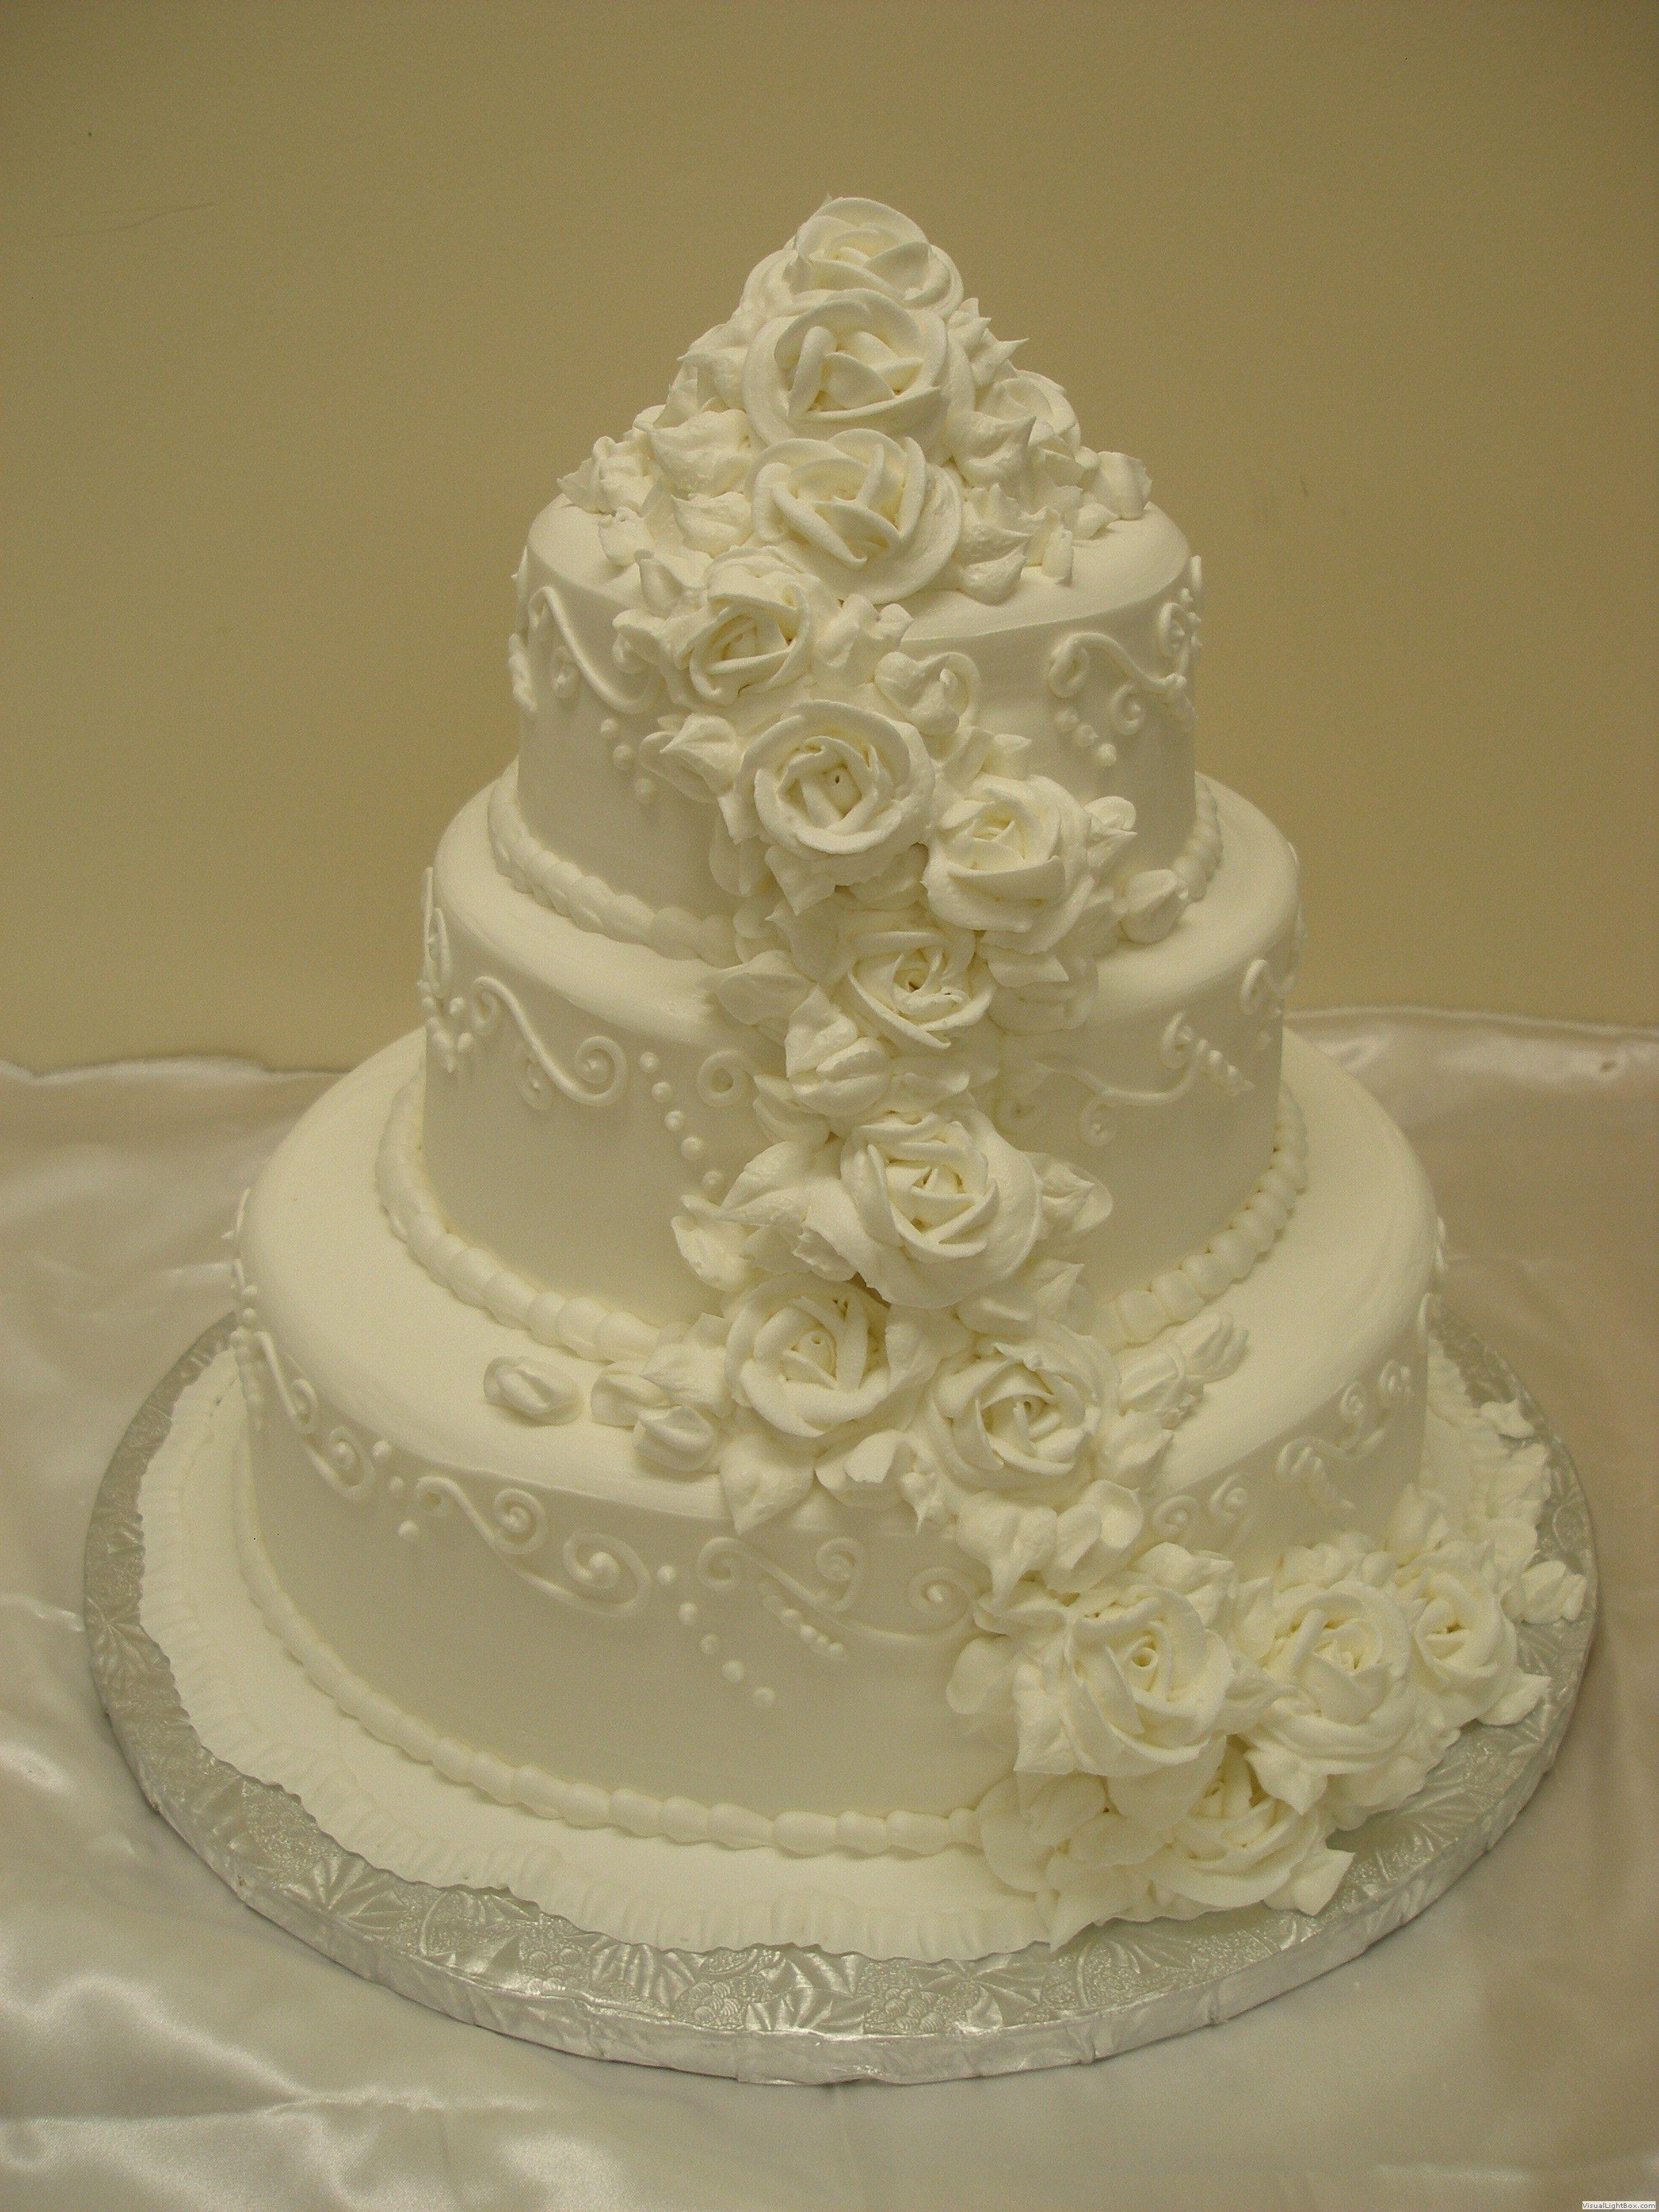 Gatlinburg Wedding Cakes  Smoky Mountain Cakes • Browse our photographs of beautiful